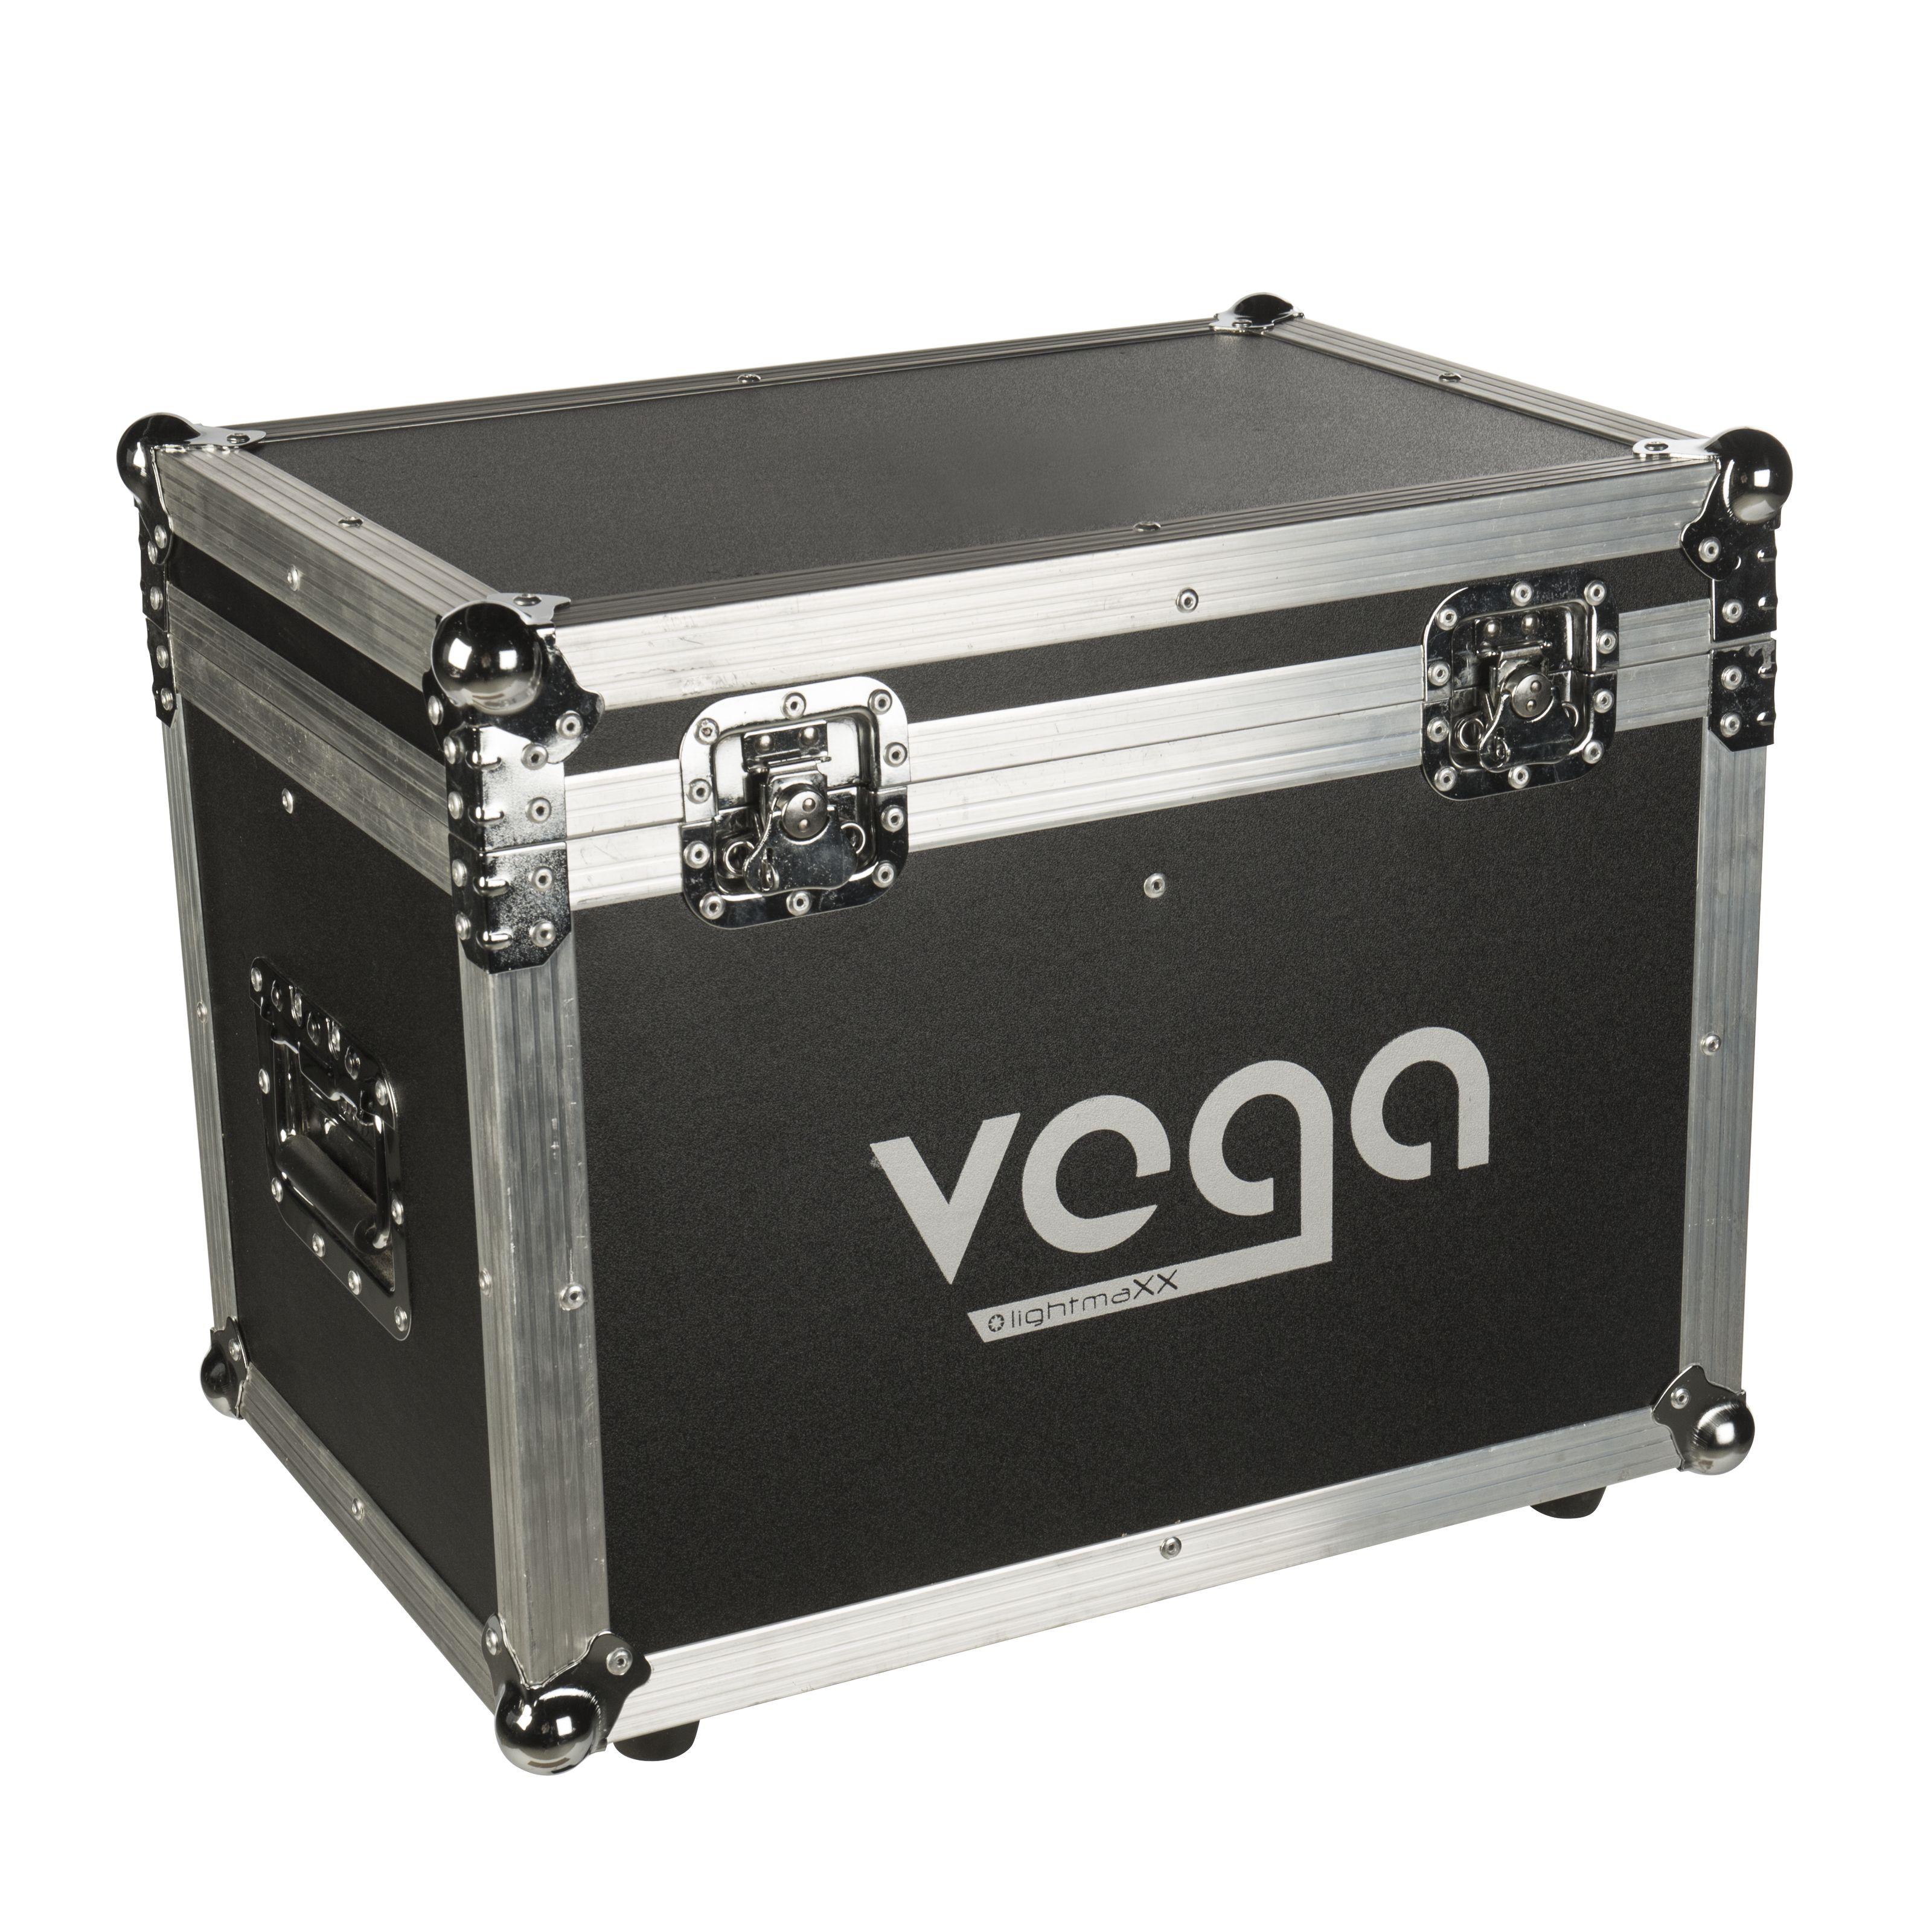 lightmaXX - TOUR CASE 4x VEGA SHIGGY quadcase B-W shiggy